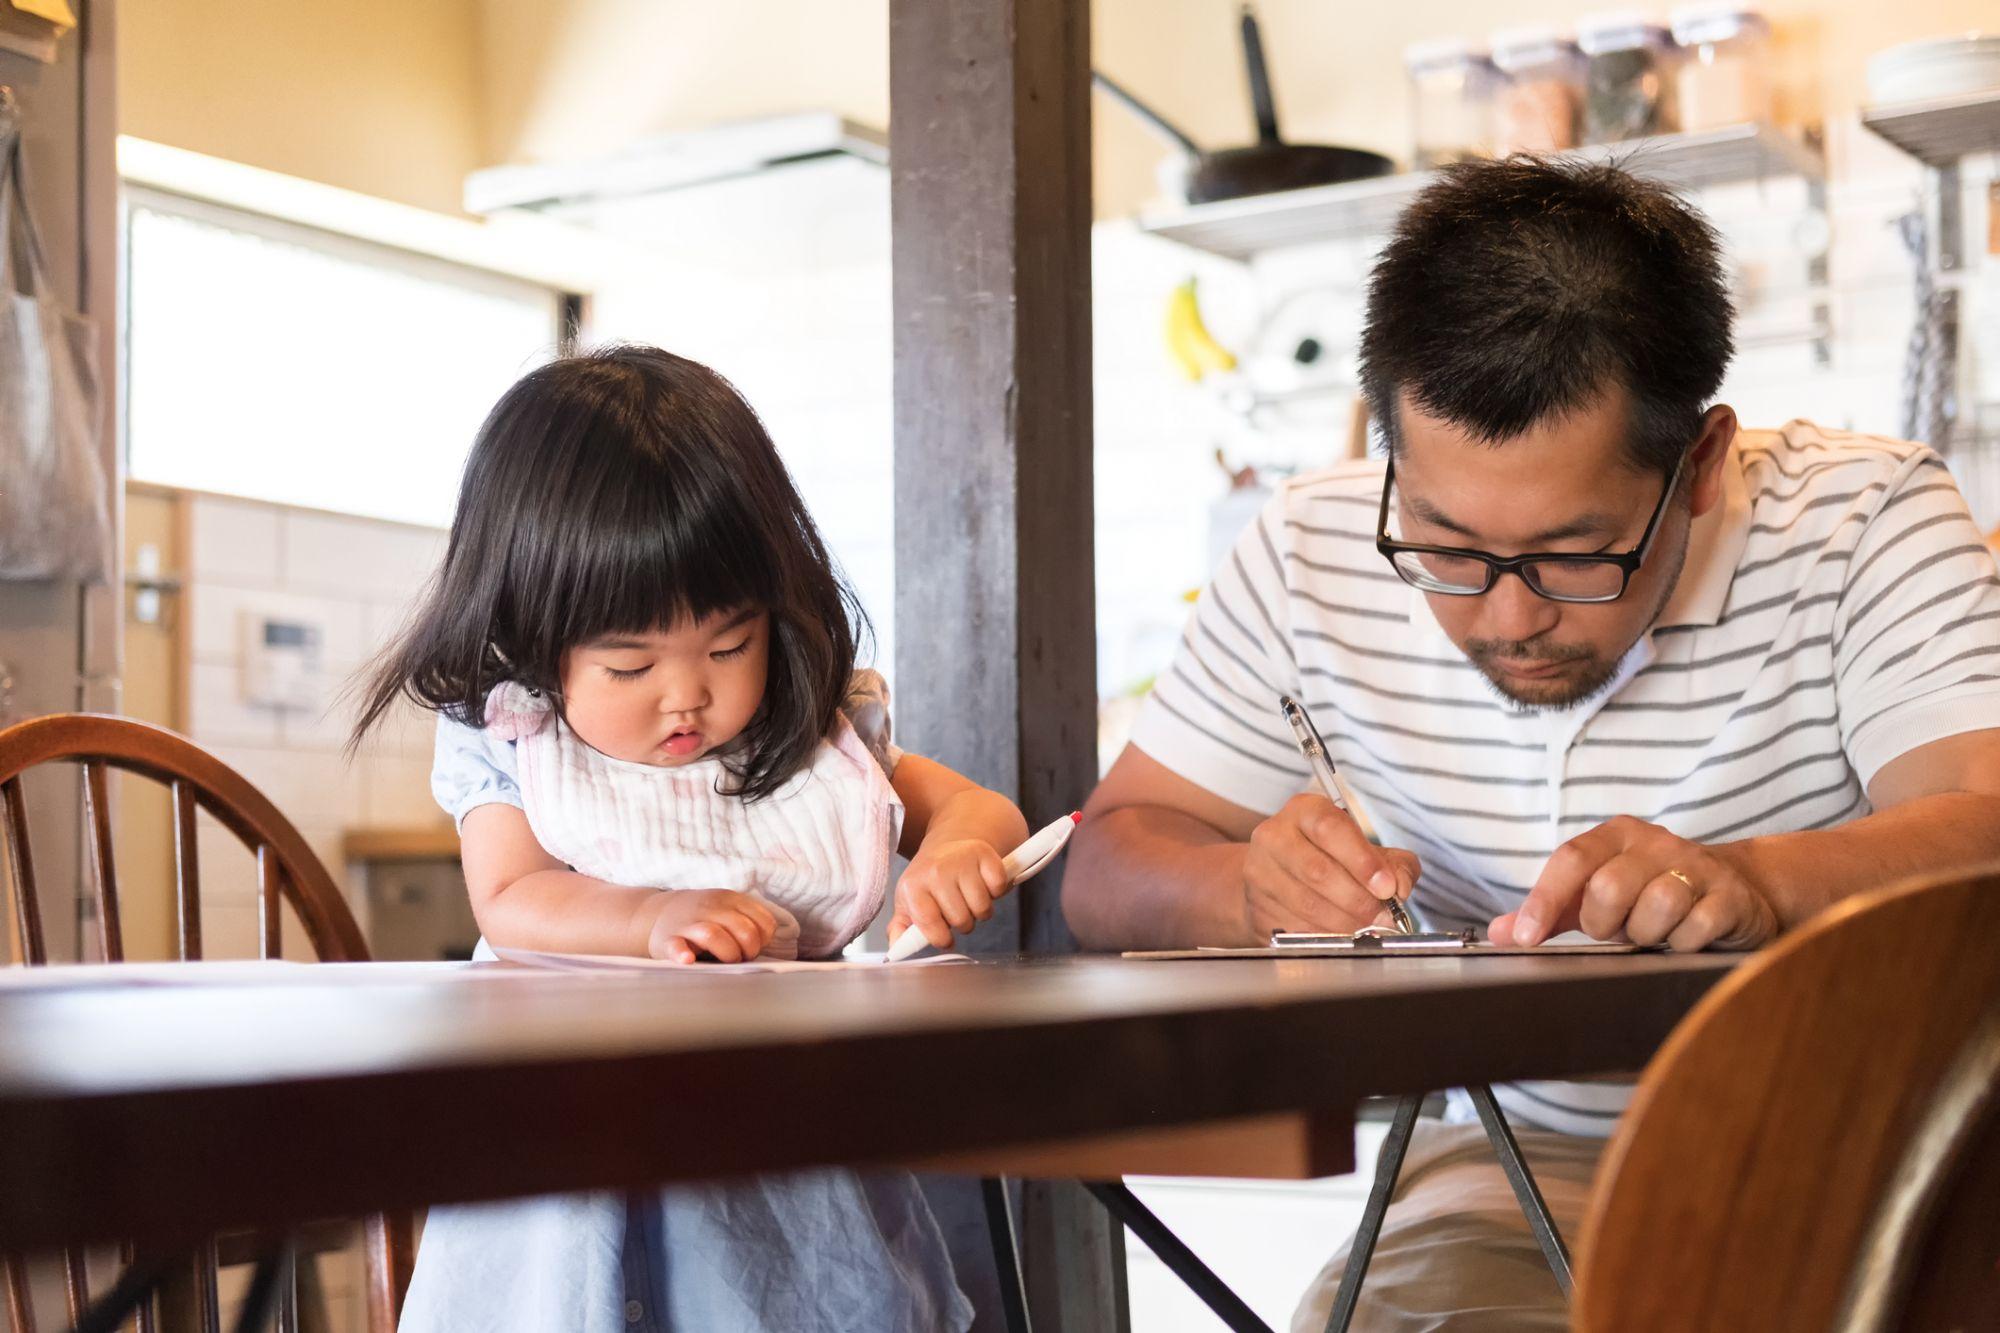 10 Ways to Begin Teaching Your Toddler Business Skills